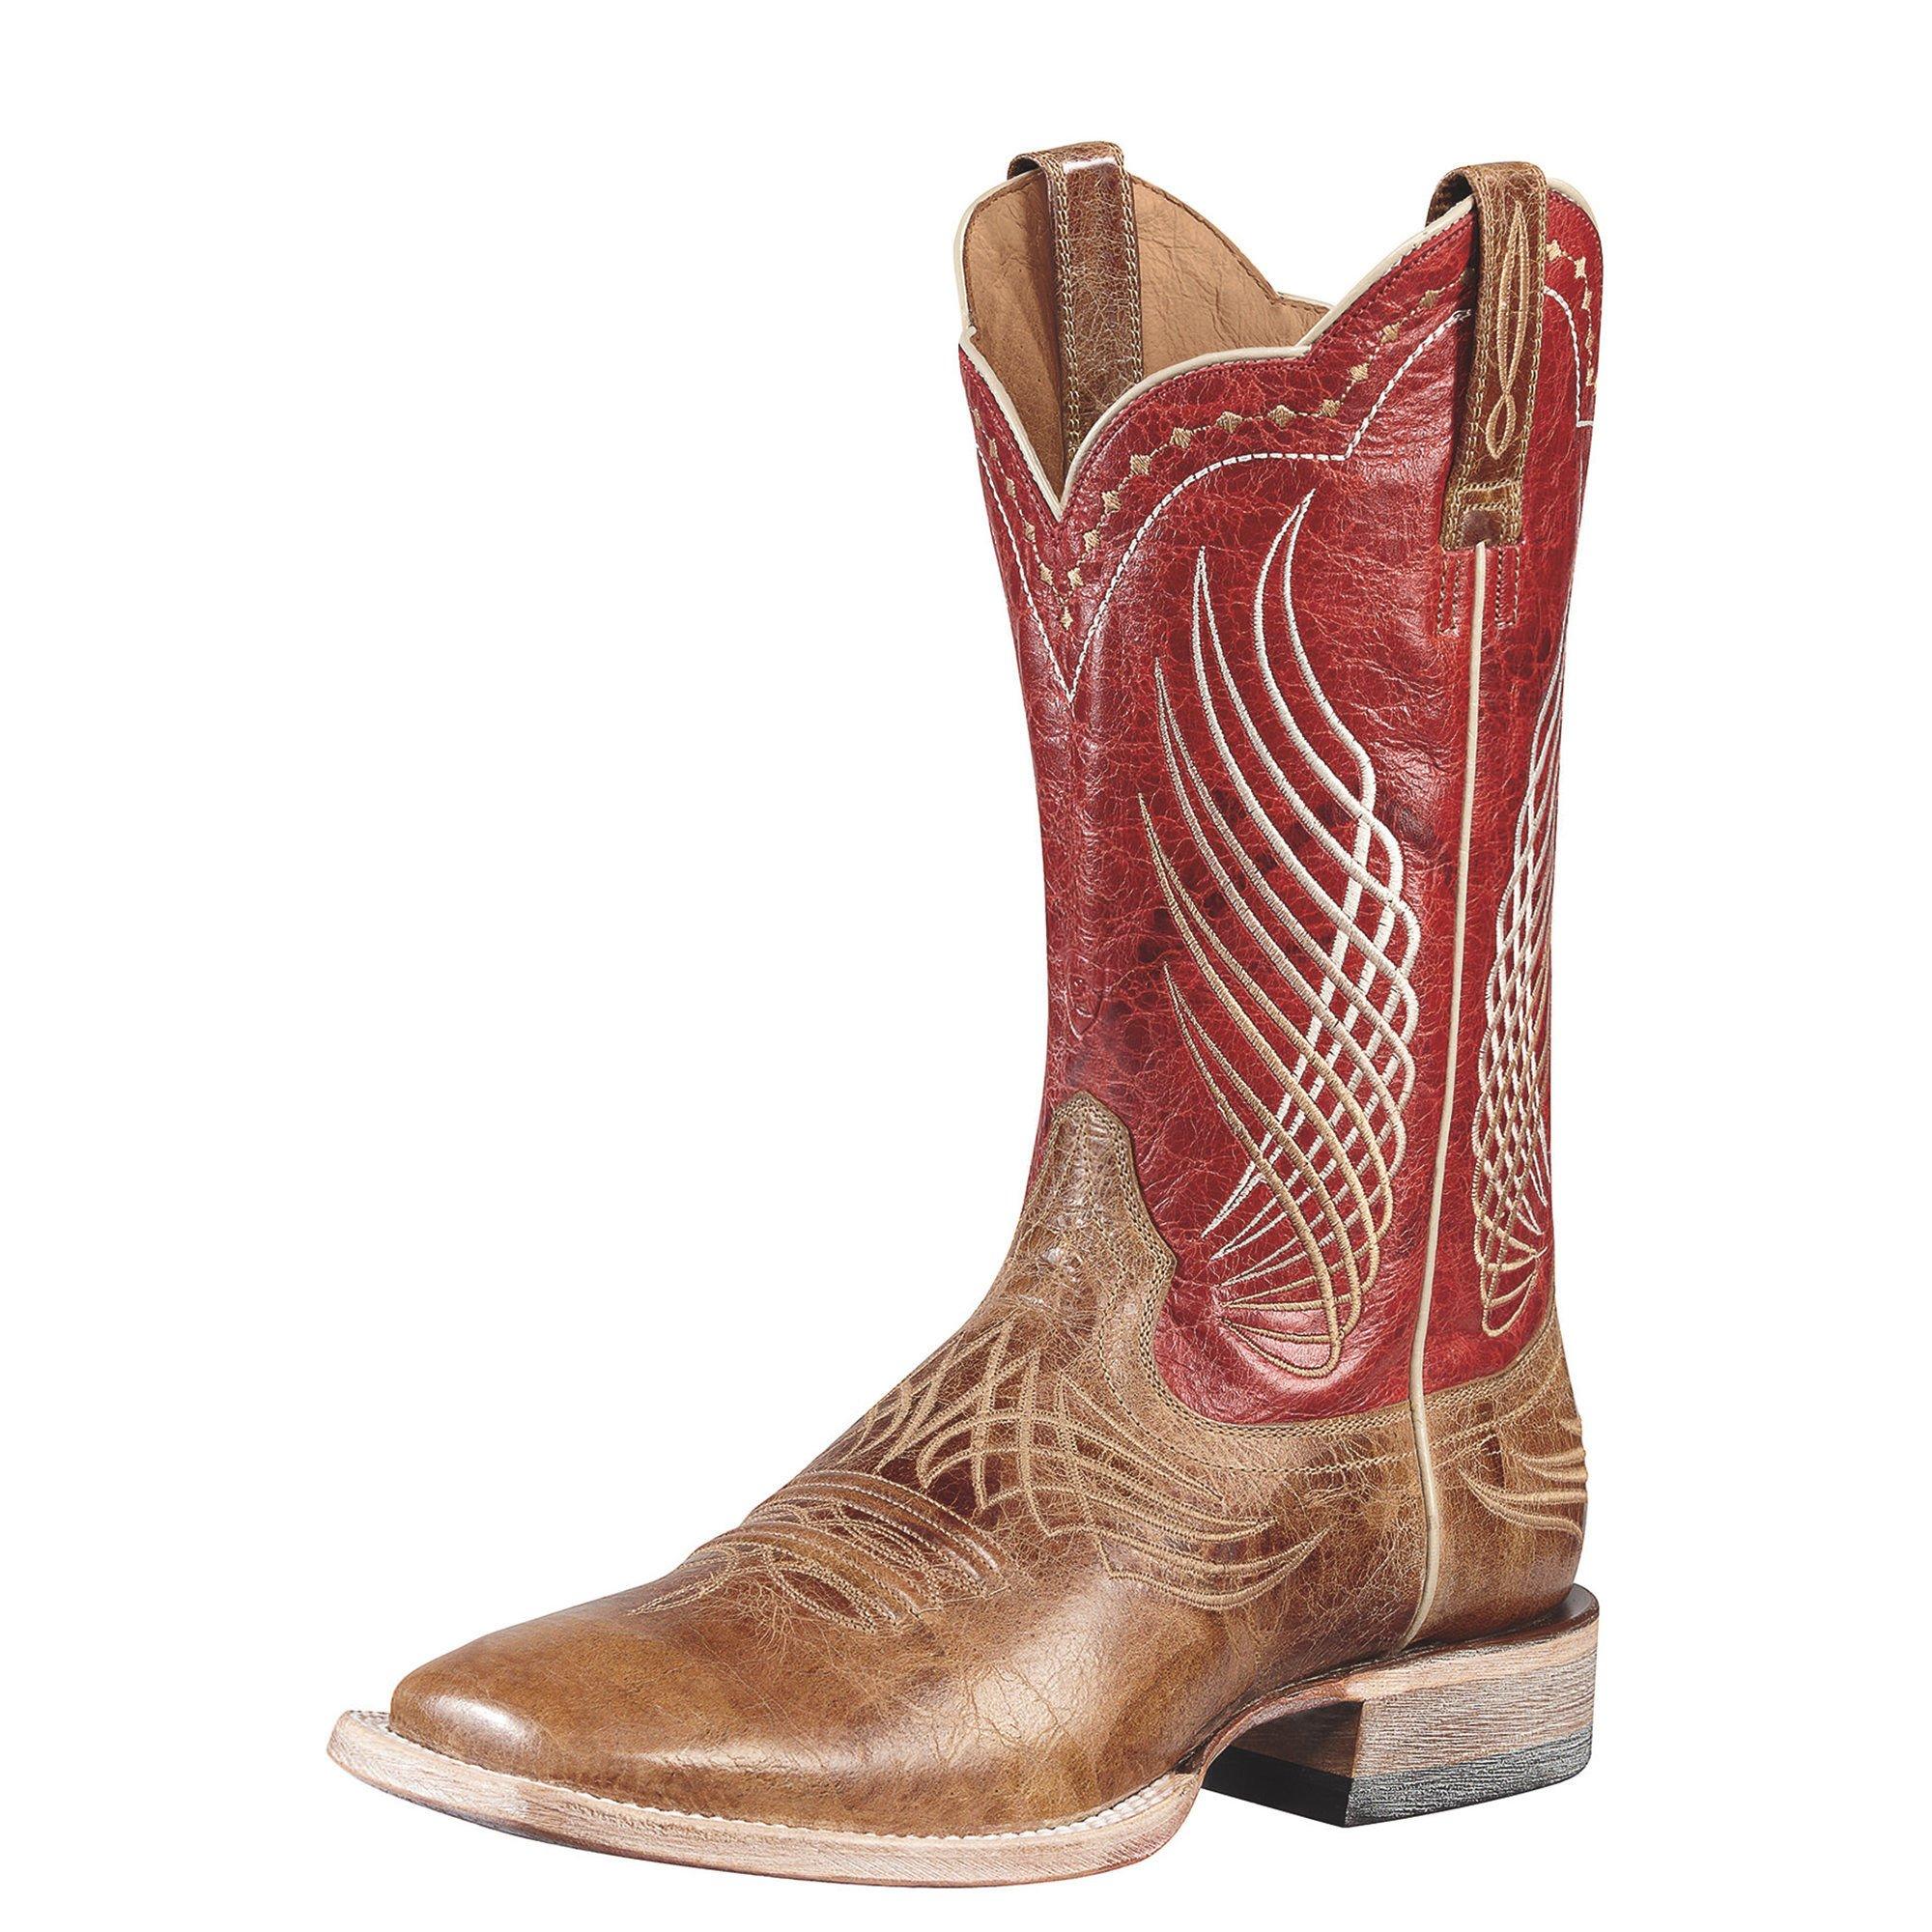 Ariat Men's Mecate Western Cowboy Boot, Wildhorse Tan/Red Fire, 12 M US